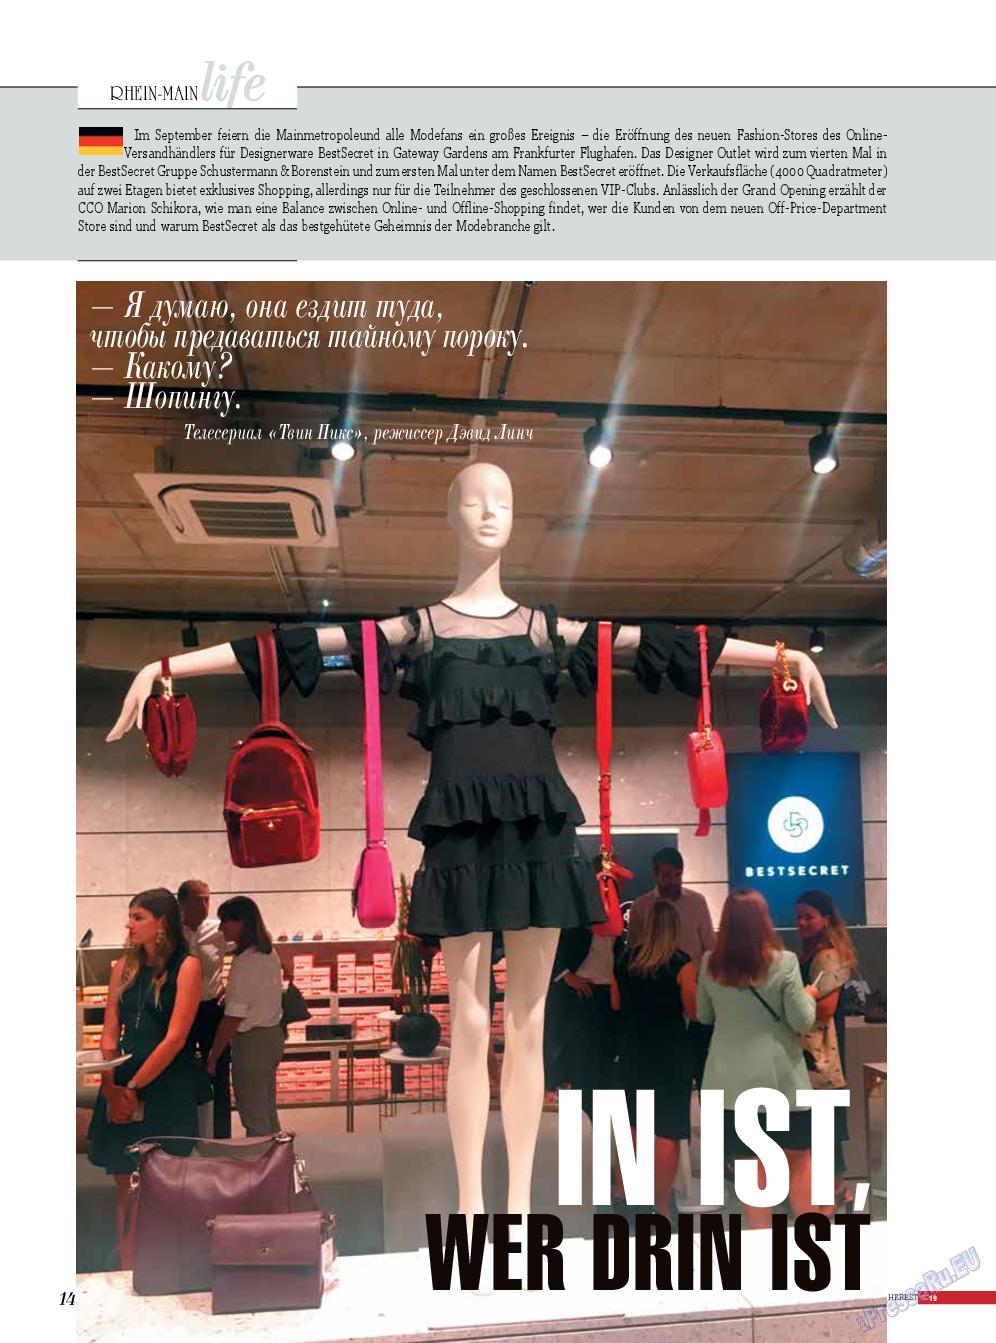 Life in Франкфурт (журнал). 2019 год, номер 44, стр. 14